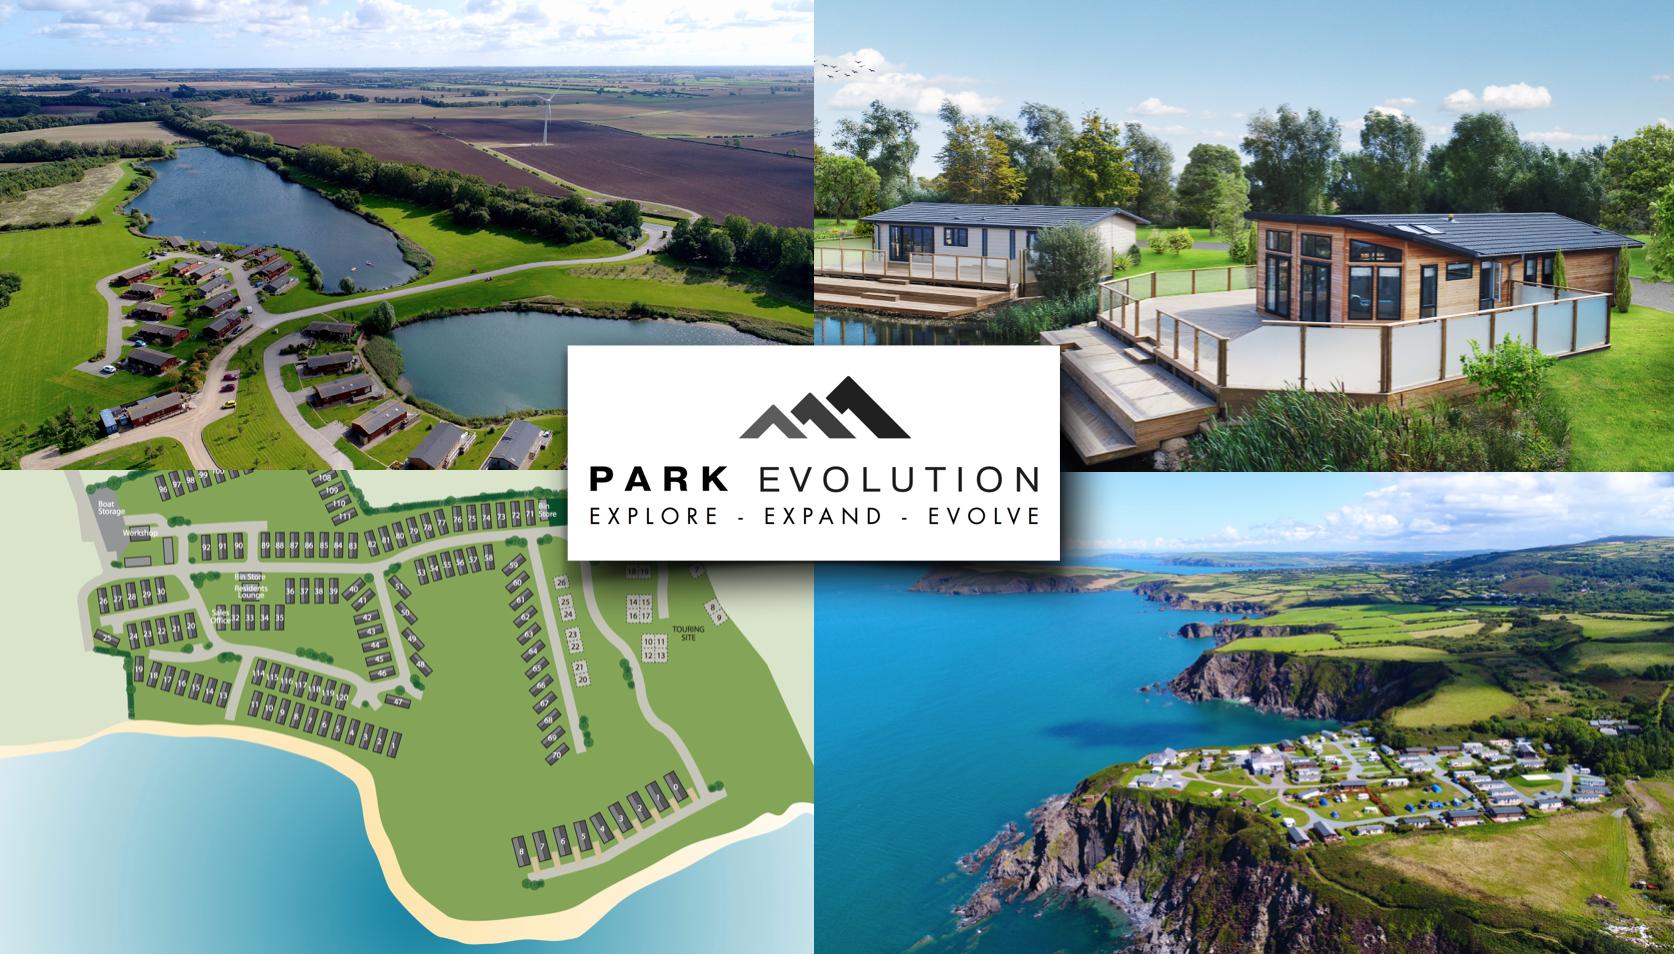 Park Evolution